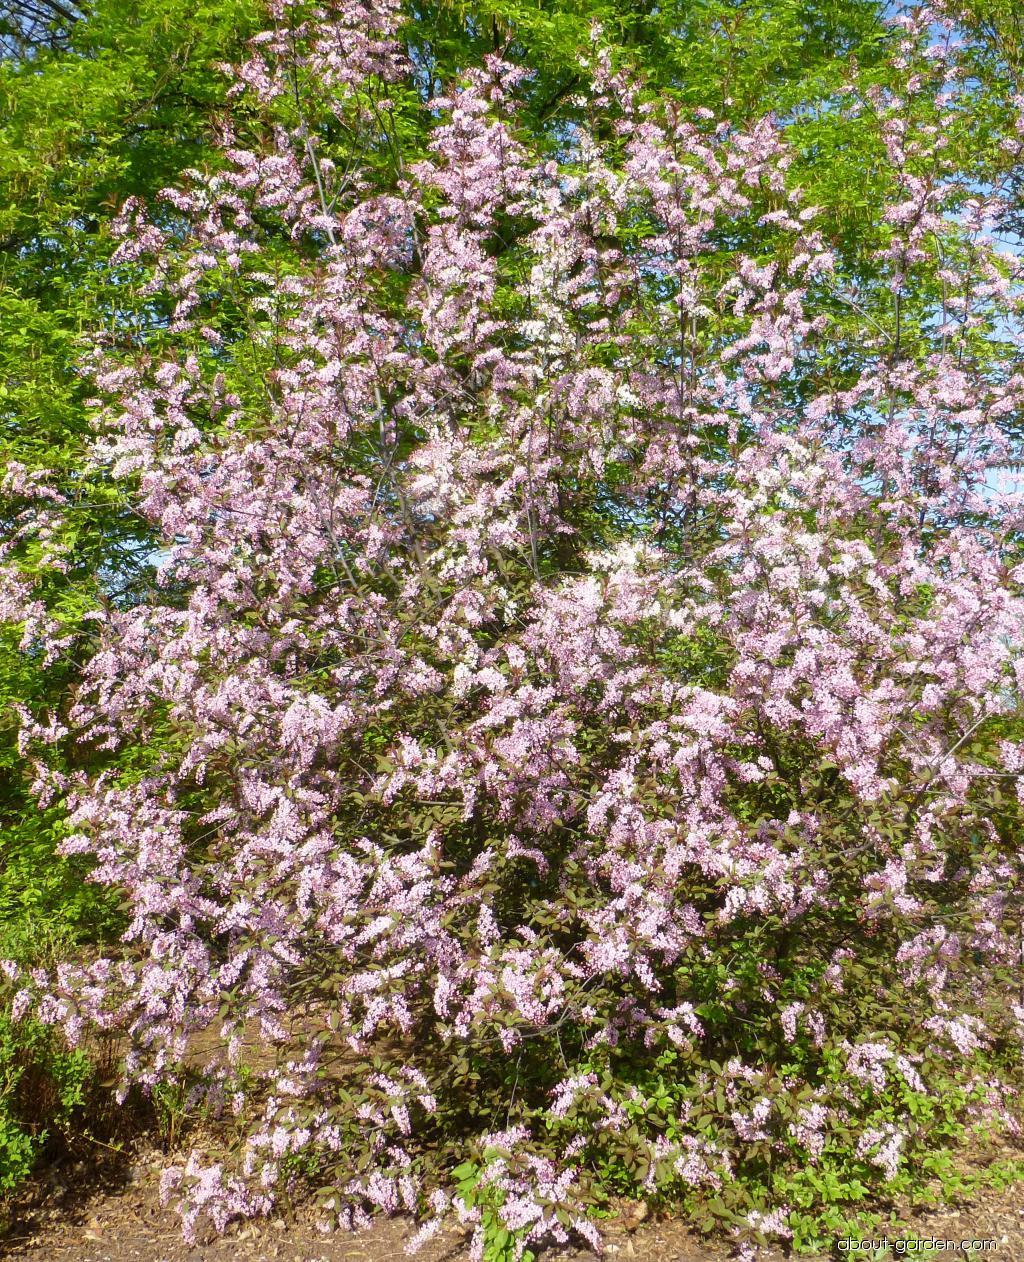 Střemcha obecná Colorata - habitus v květu (Prunus padus)